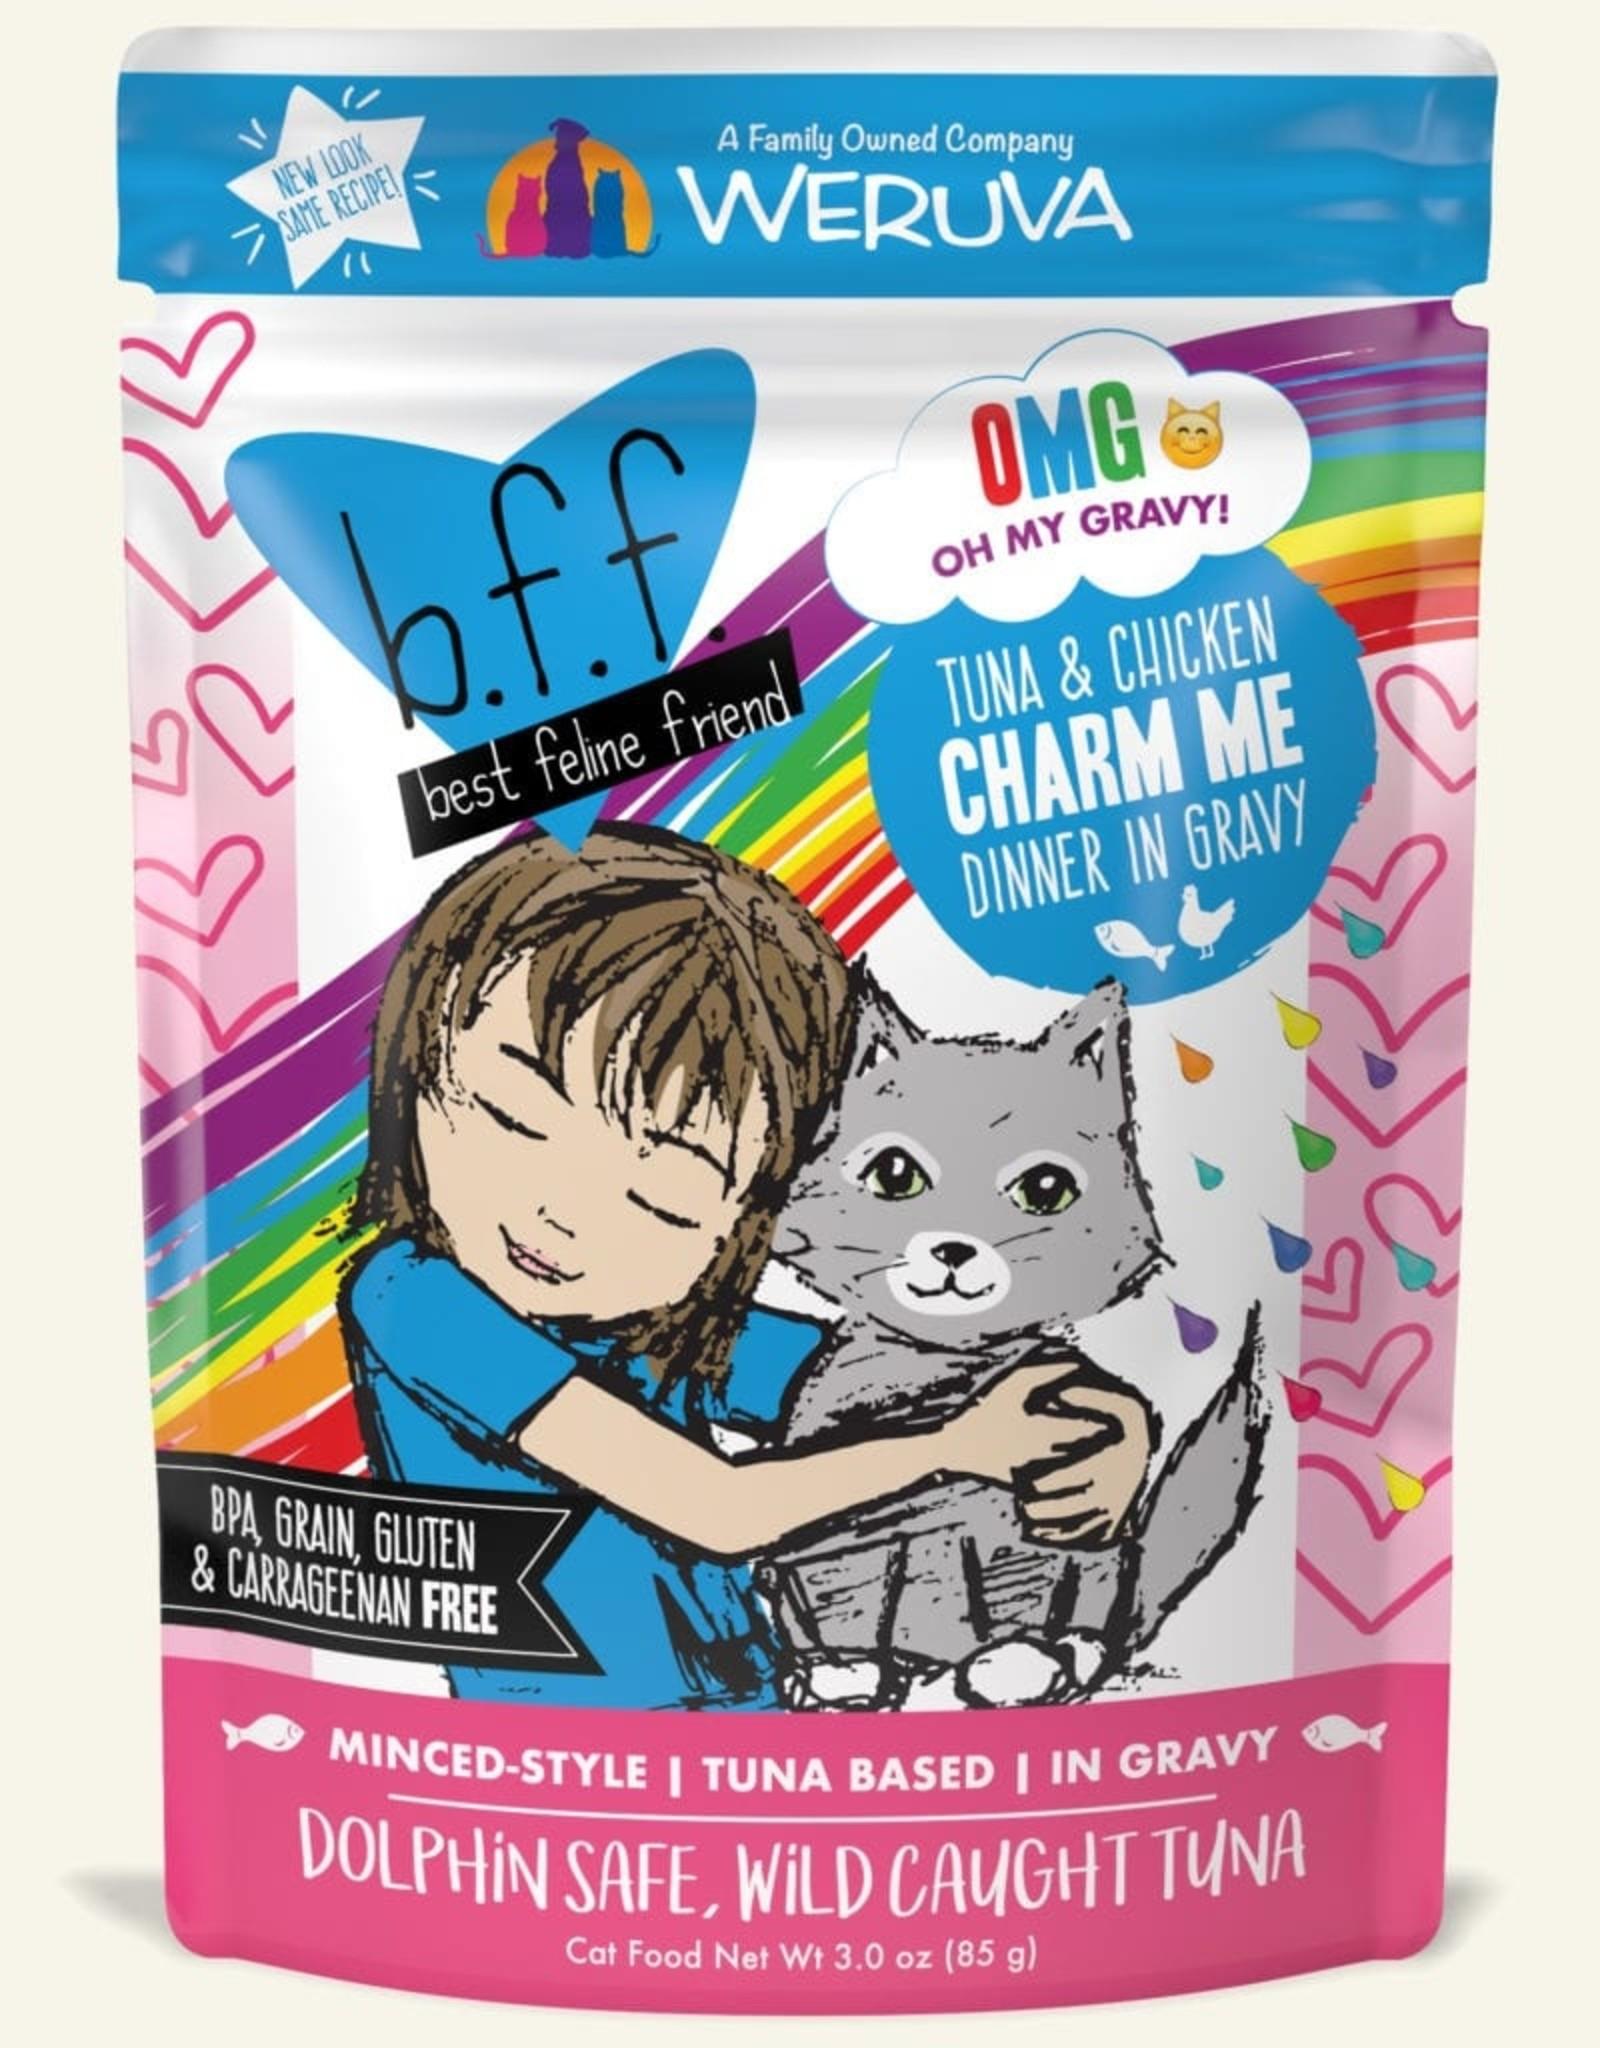 Weruva BFF - Tuna&Chk Charm Me 3oz